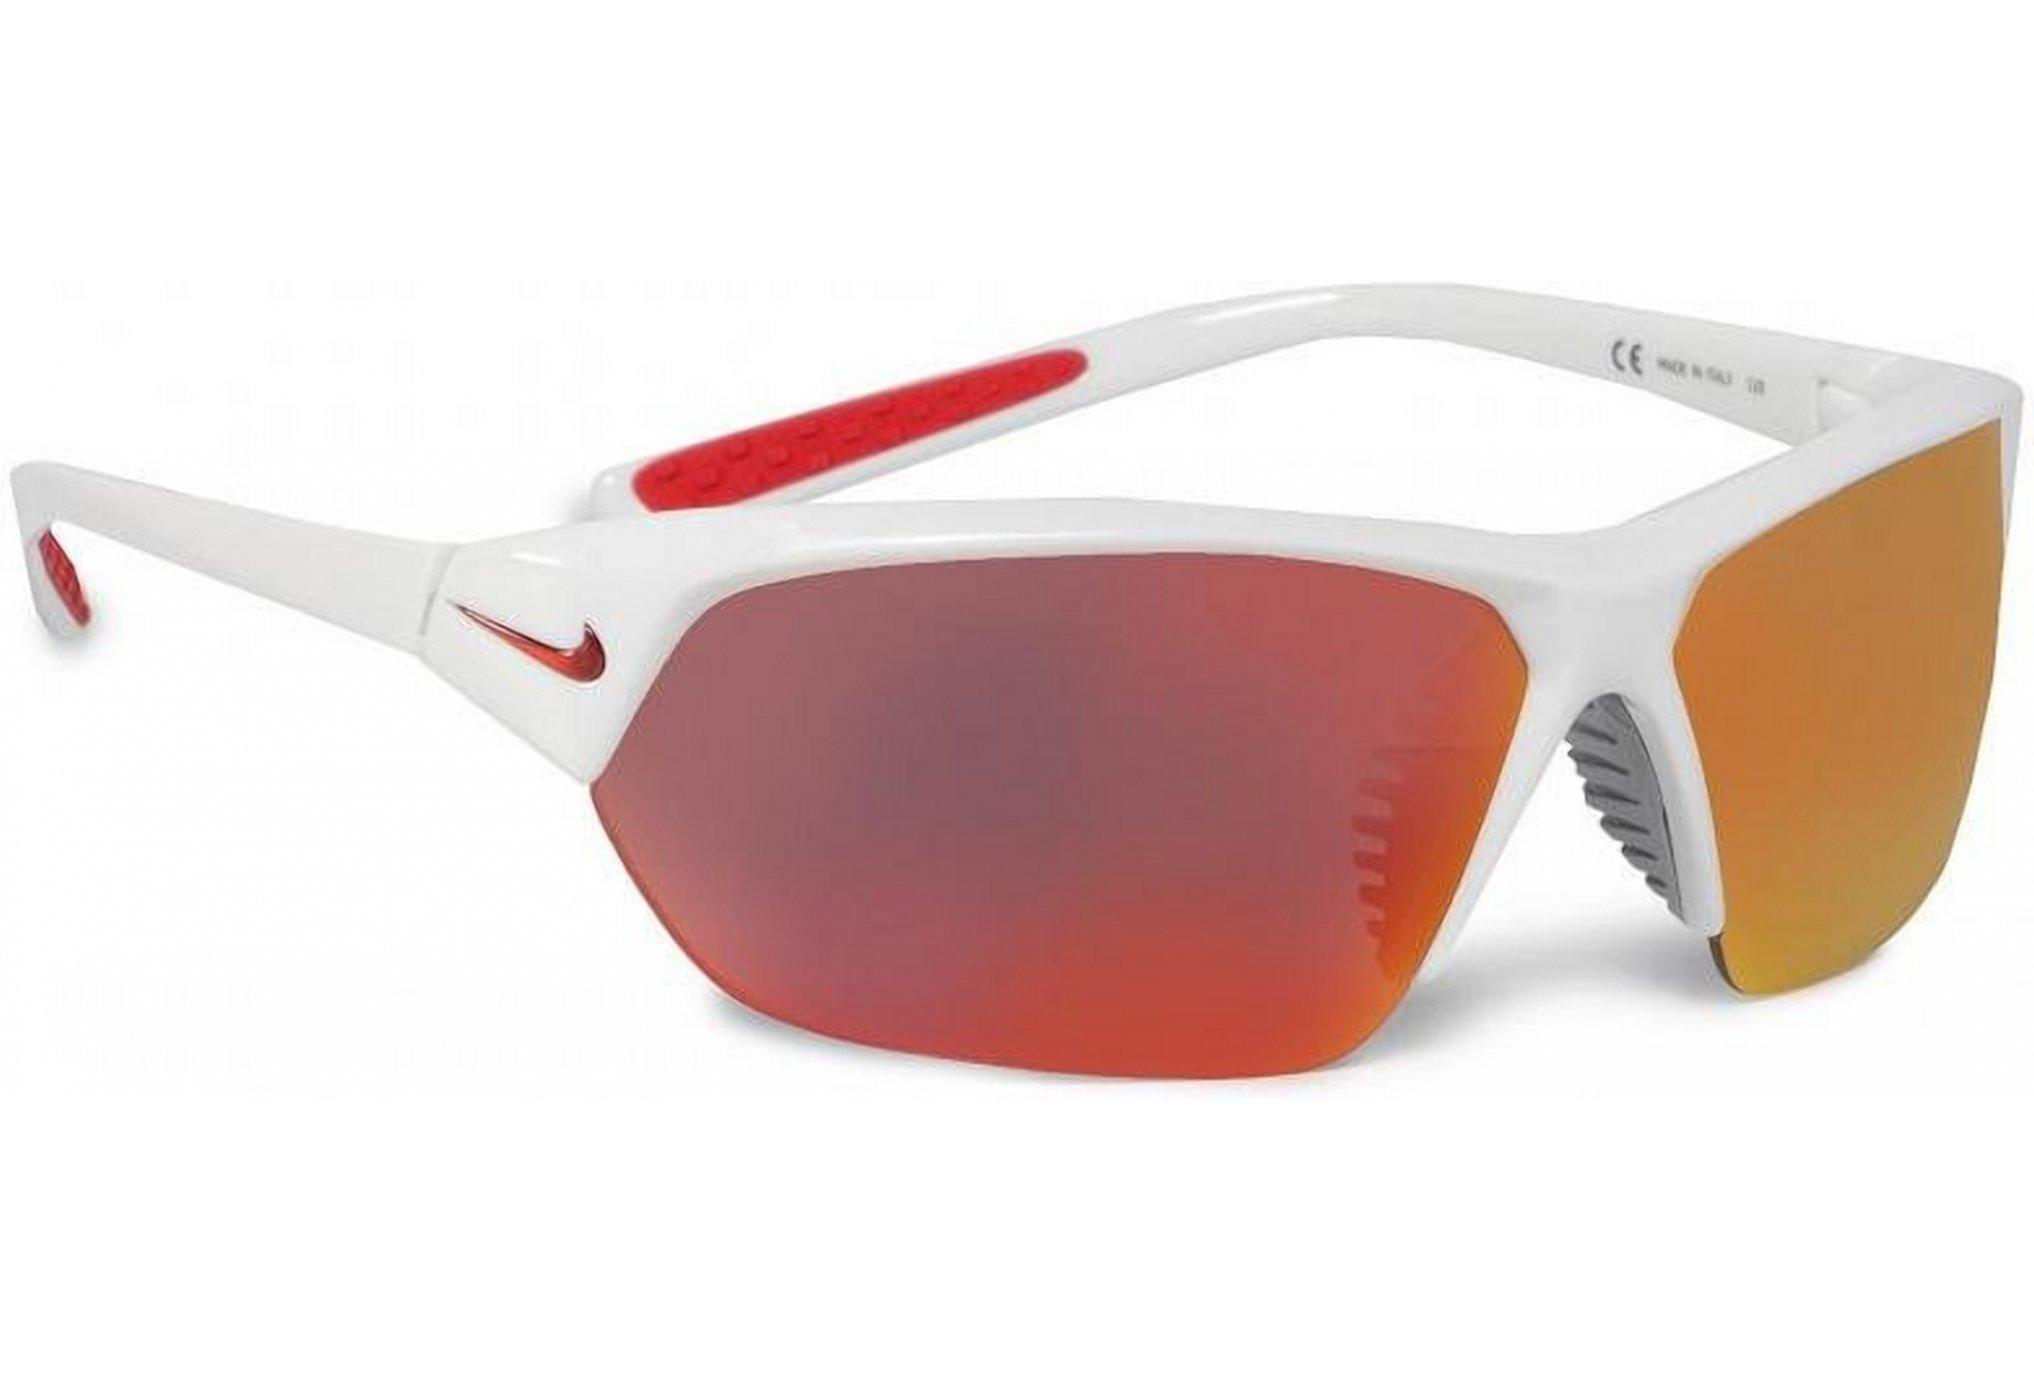 Nike Skylon Ace Mirror Lunettes